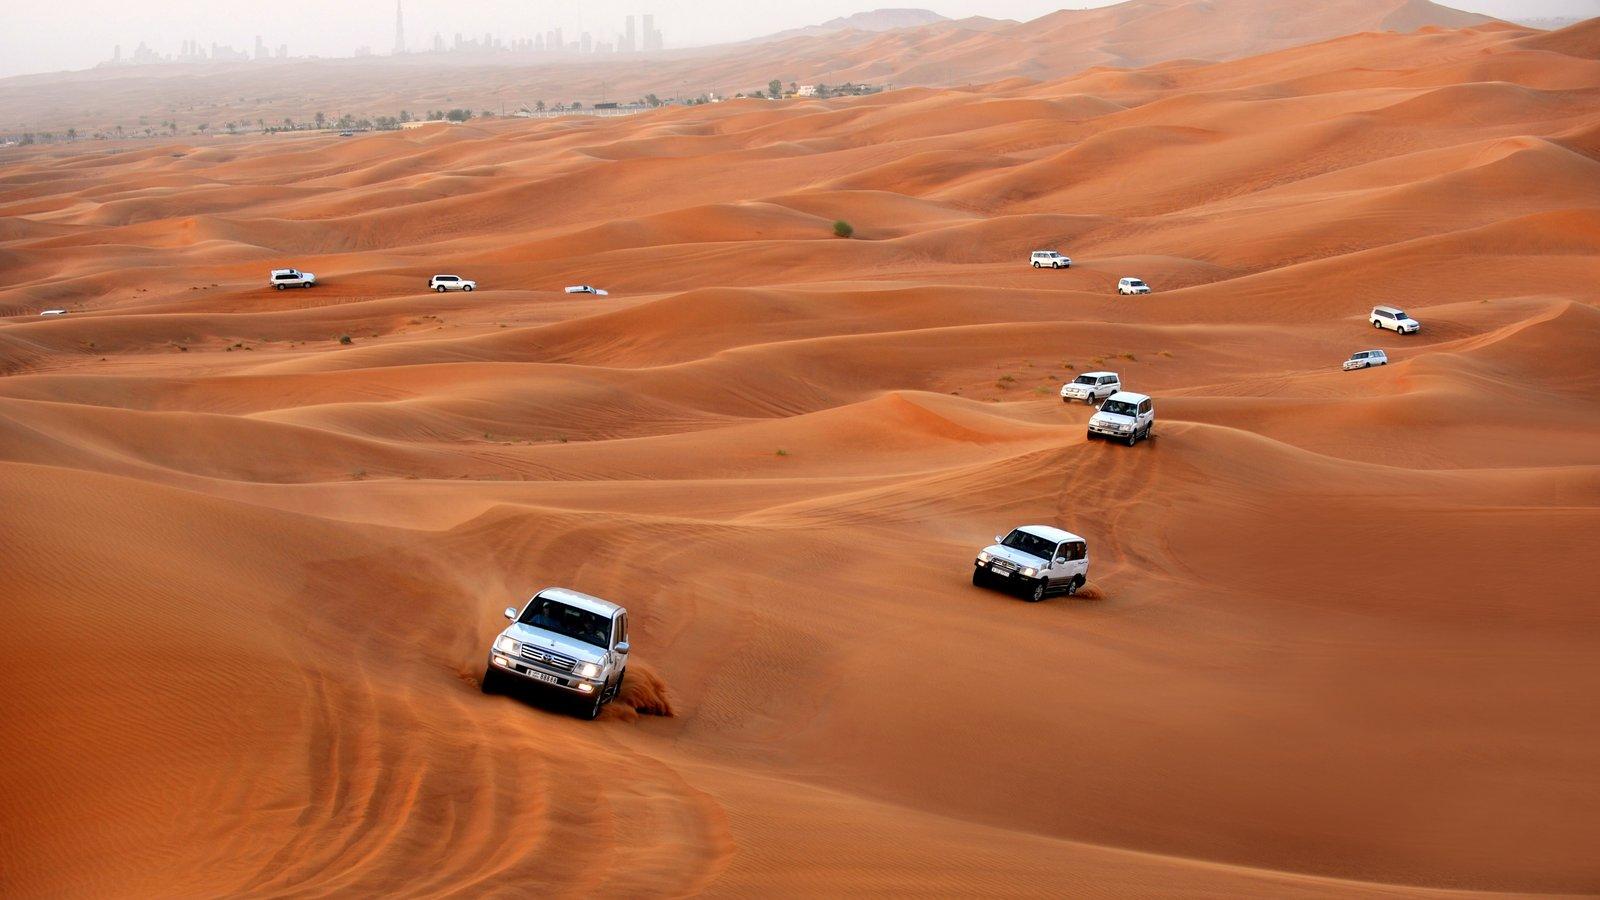 Dubai Desert showing touring, desert views and off-road driving